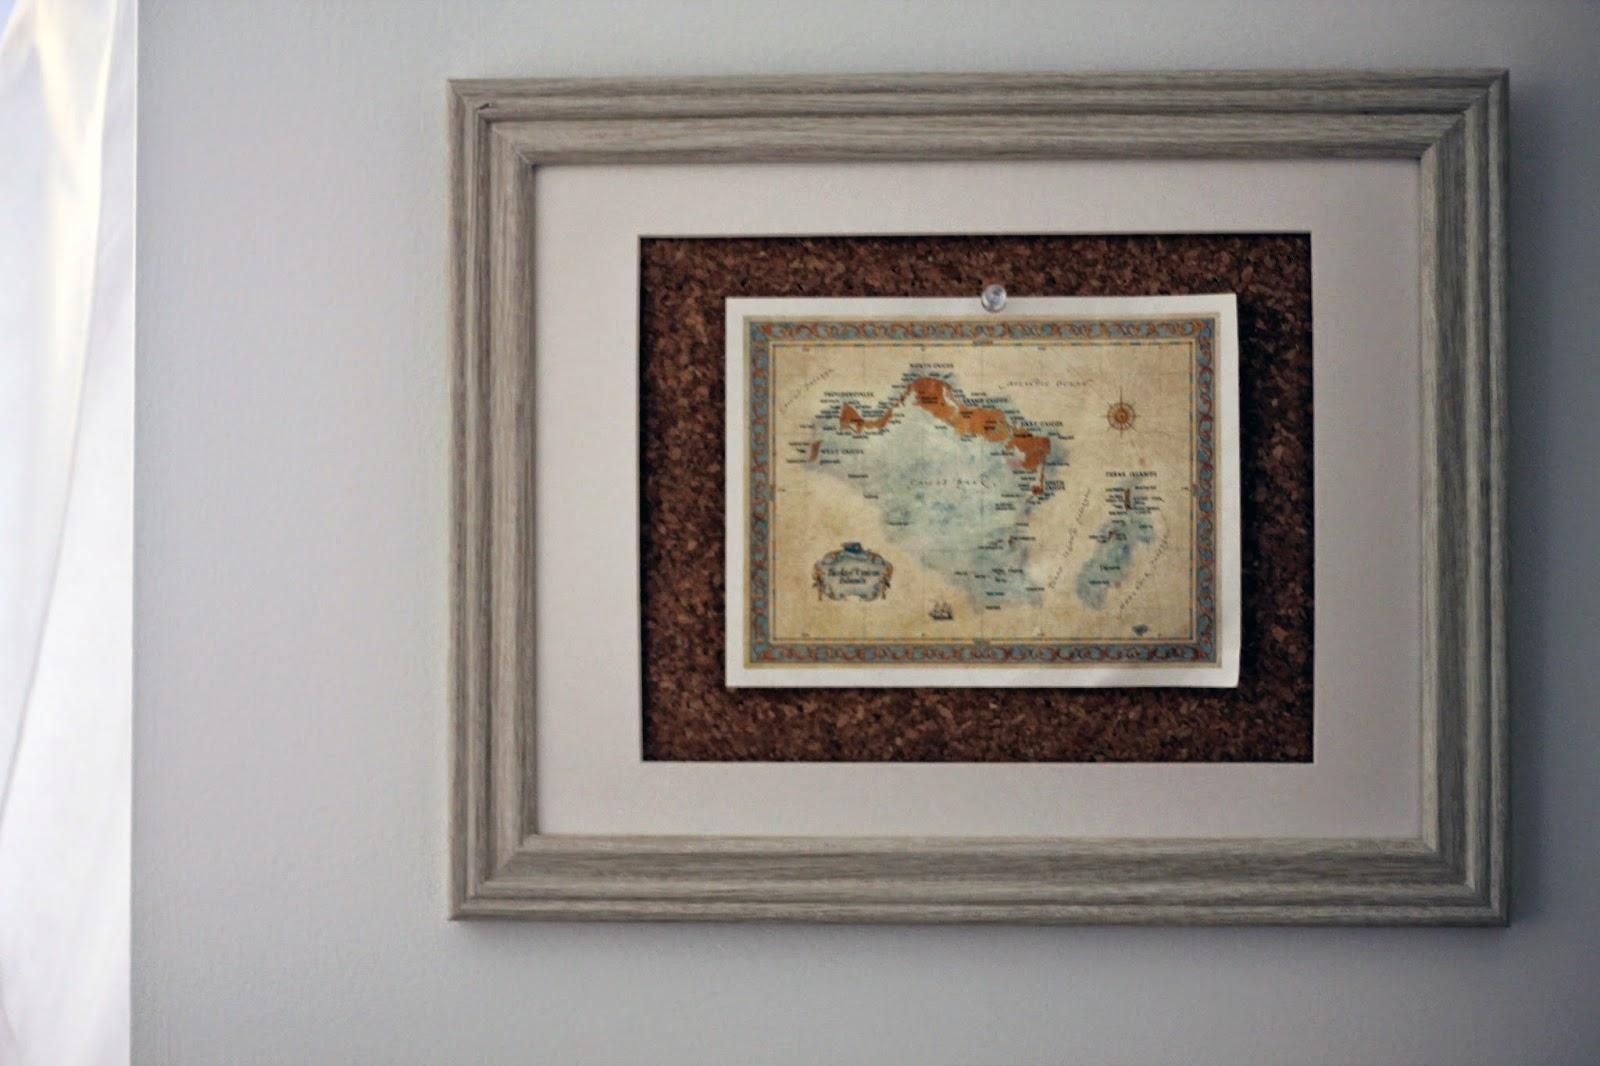 how to frame a postcard, postcard frame, postcard cork board, corkboard DIY frame